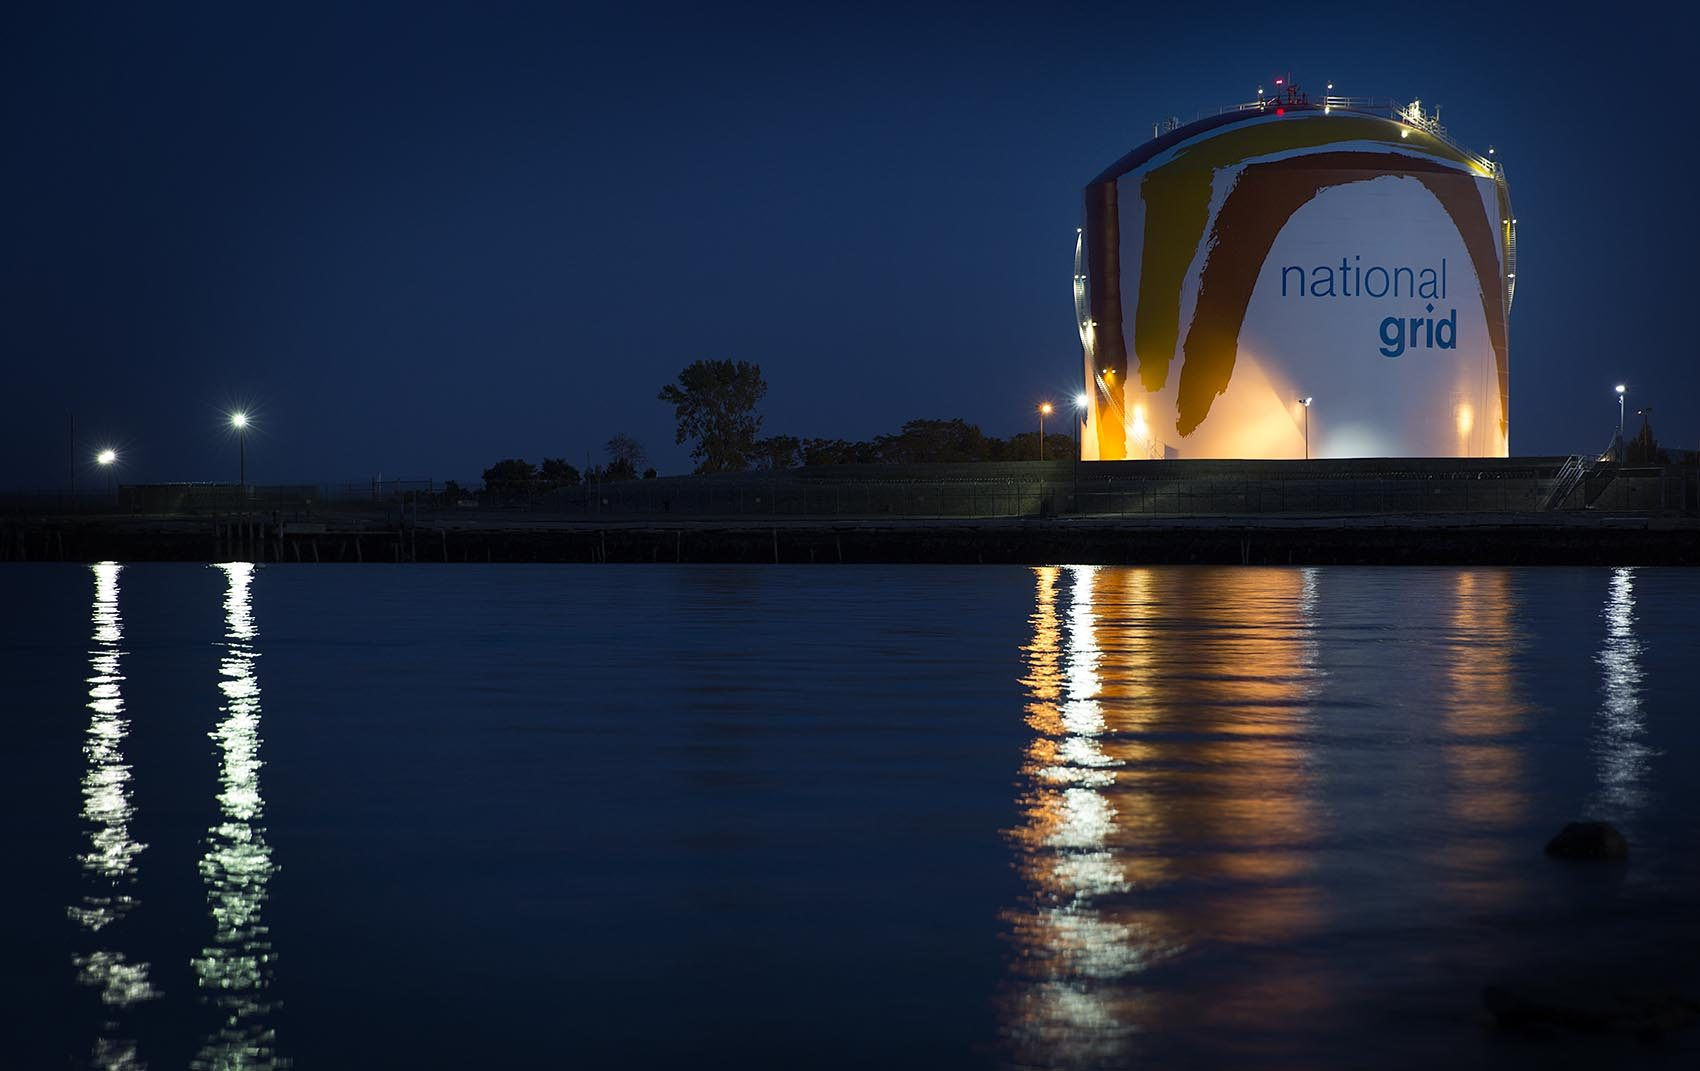 Corita Kent's rainbow gas tank reflects in the Dorchester Bay at night. (Robin Lubbock/WBUR)